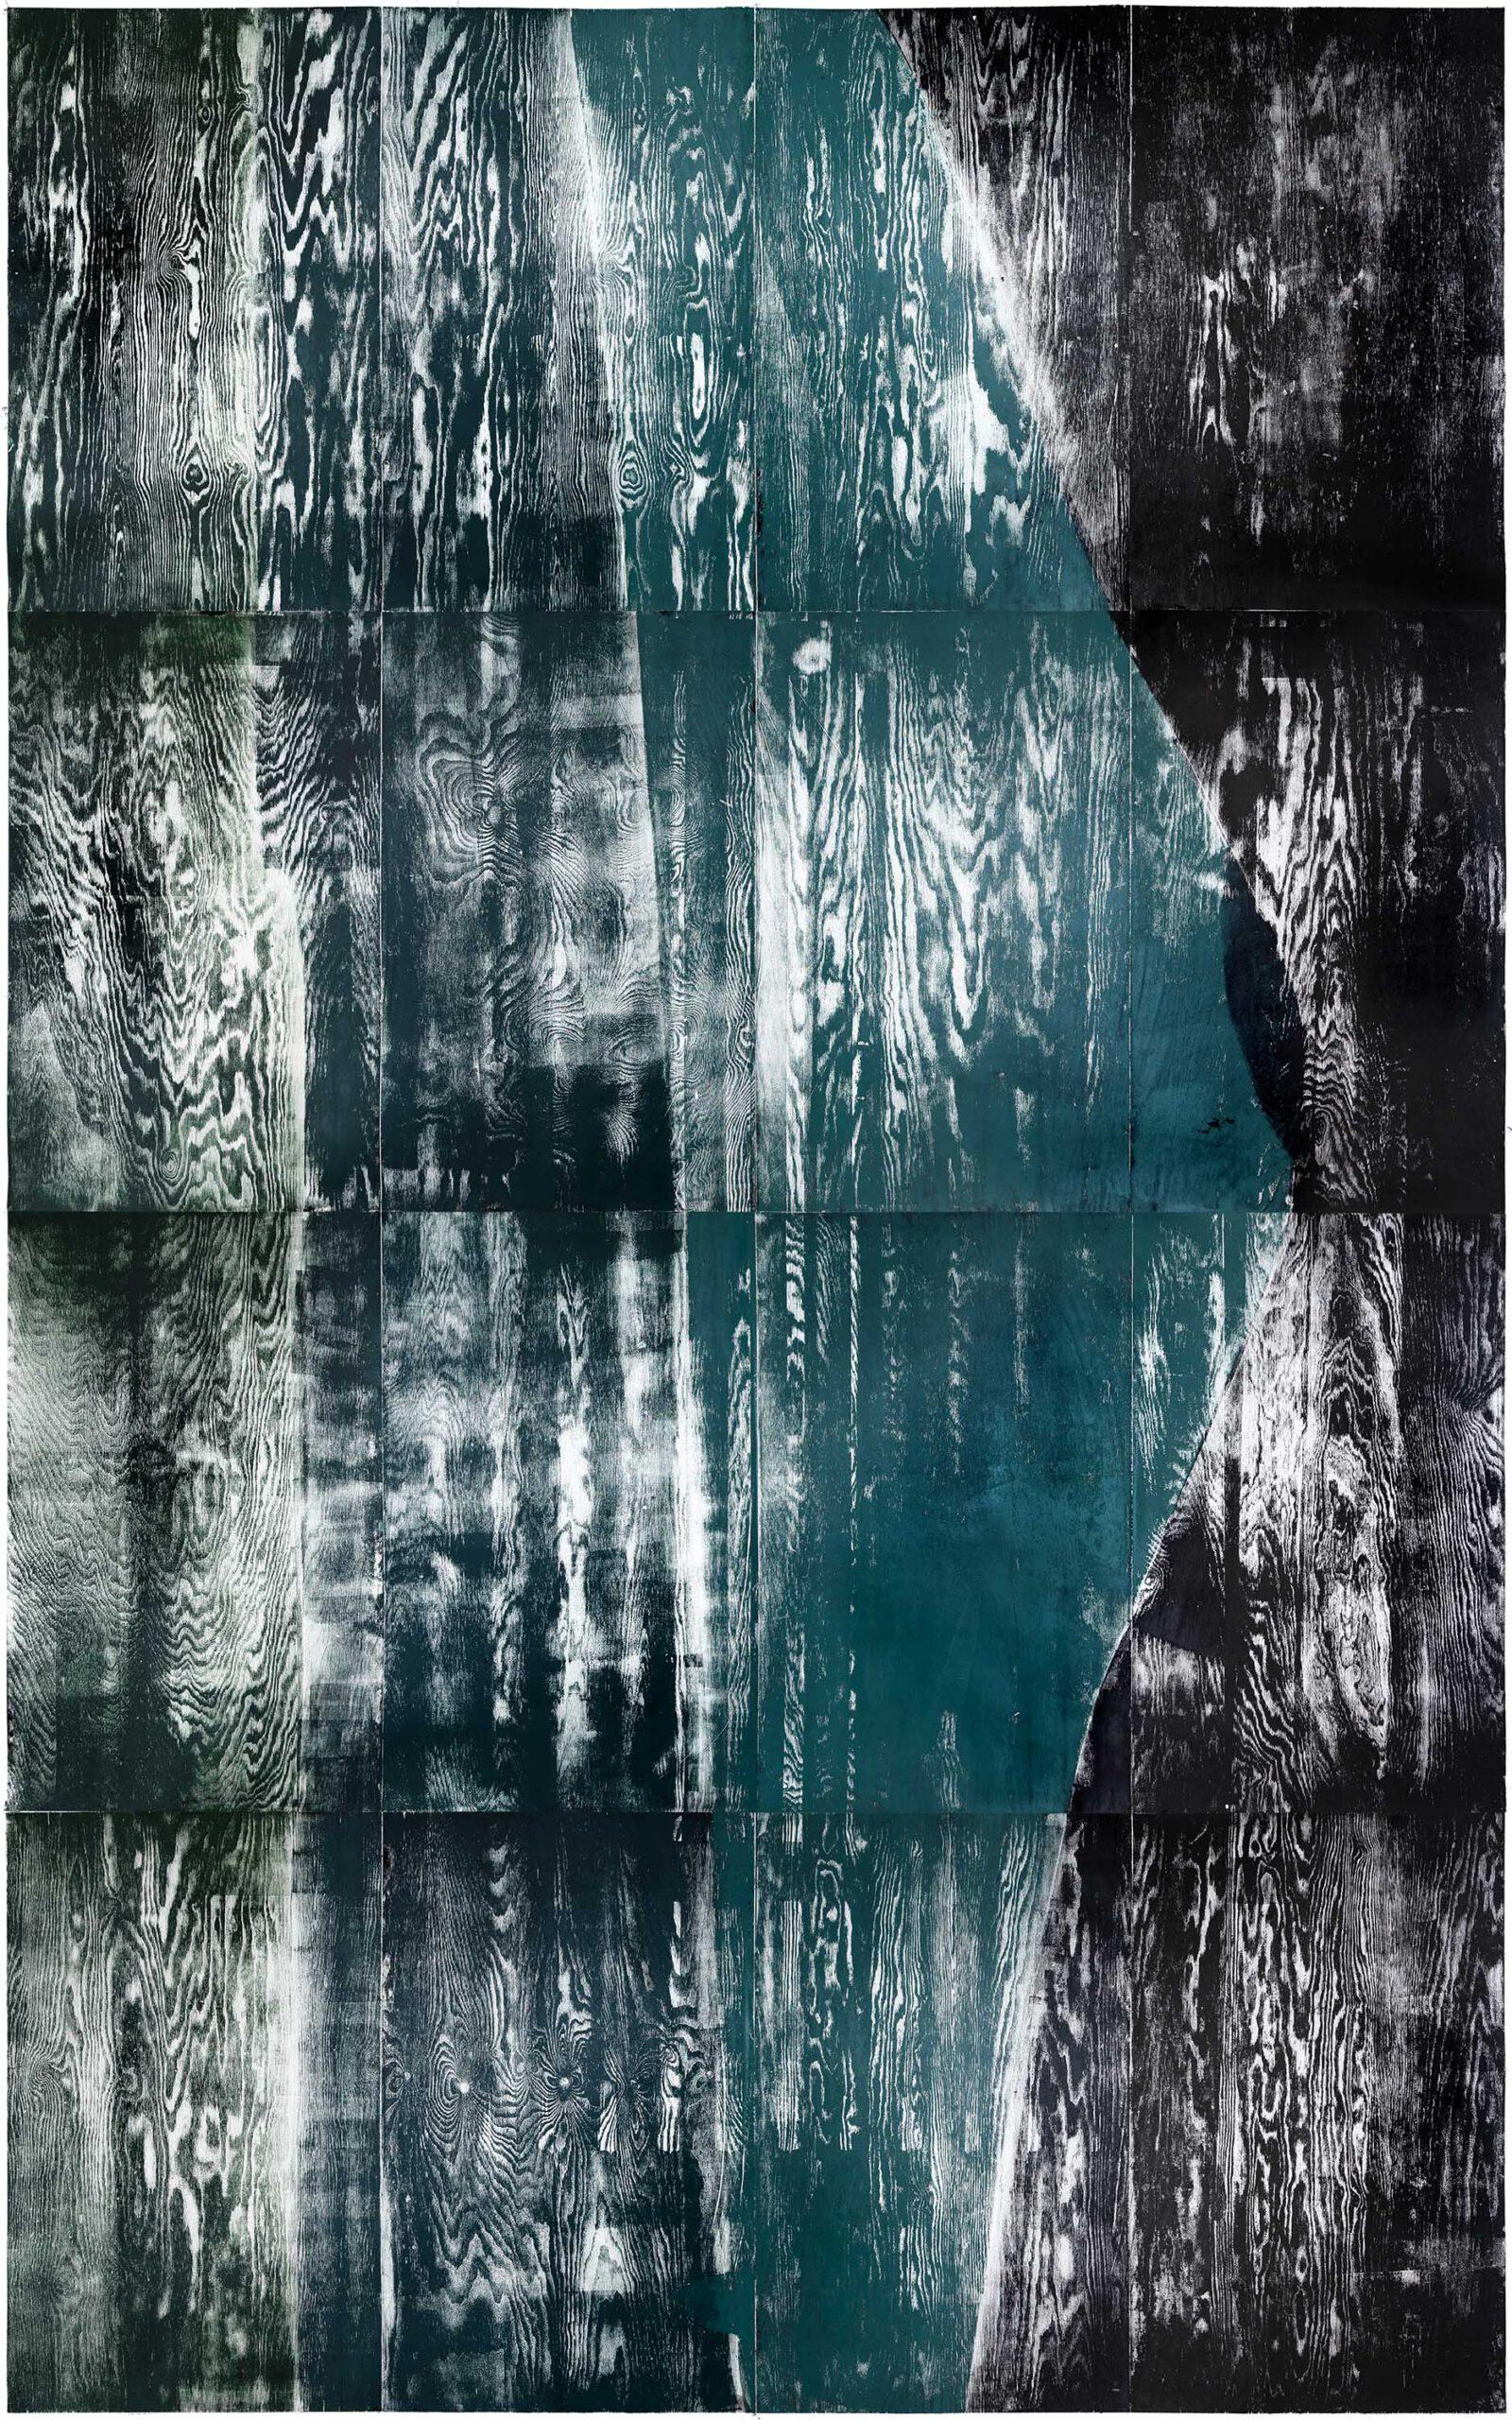 Grünfall, 2020, wood engraving, 402,4 x 258,3 cm, Genaro Strobel